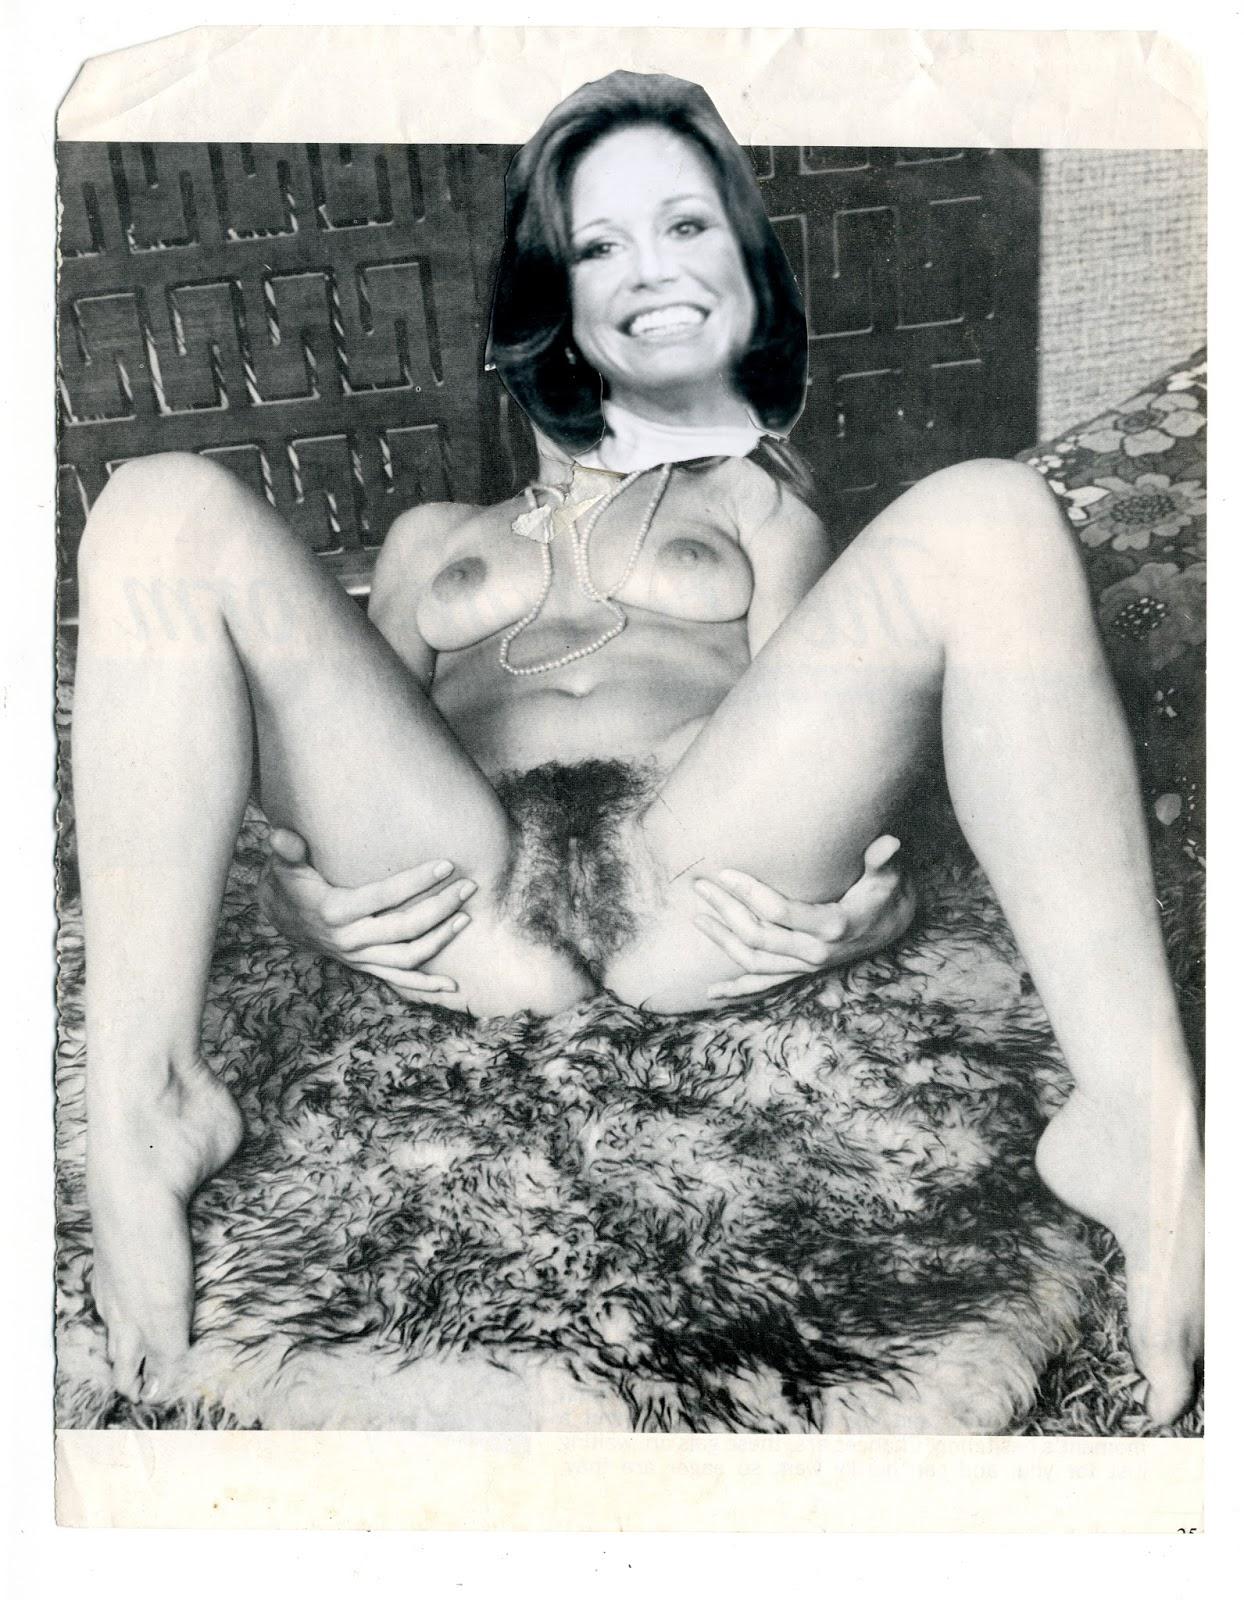 Xxx Mary Tyler Moore Porn Lesbian Videos 60